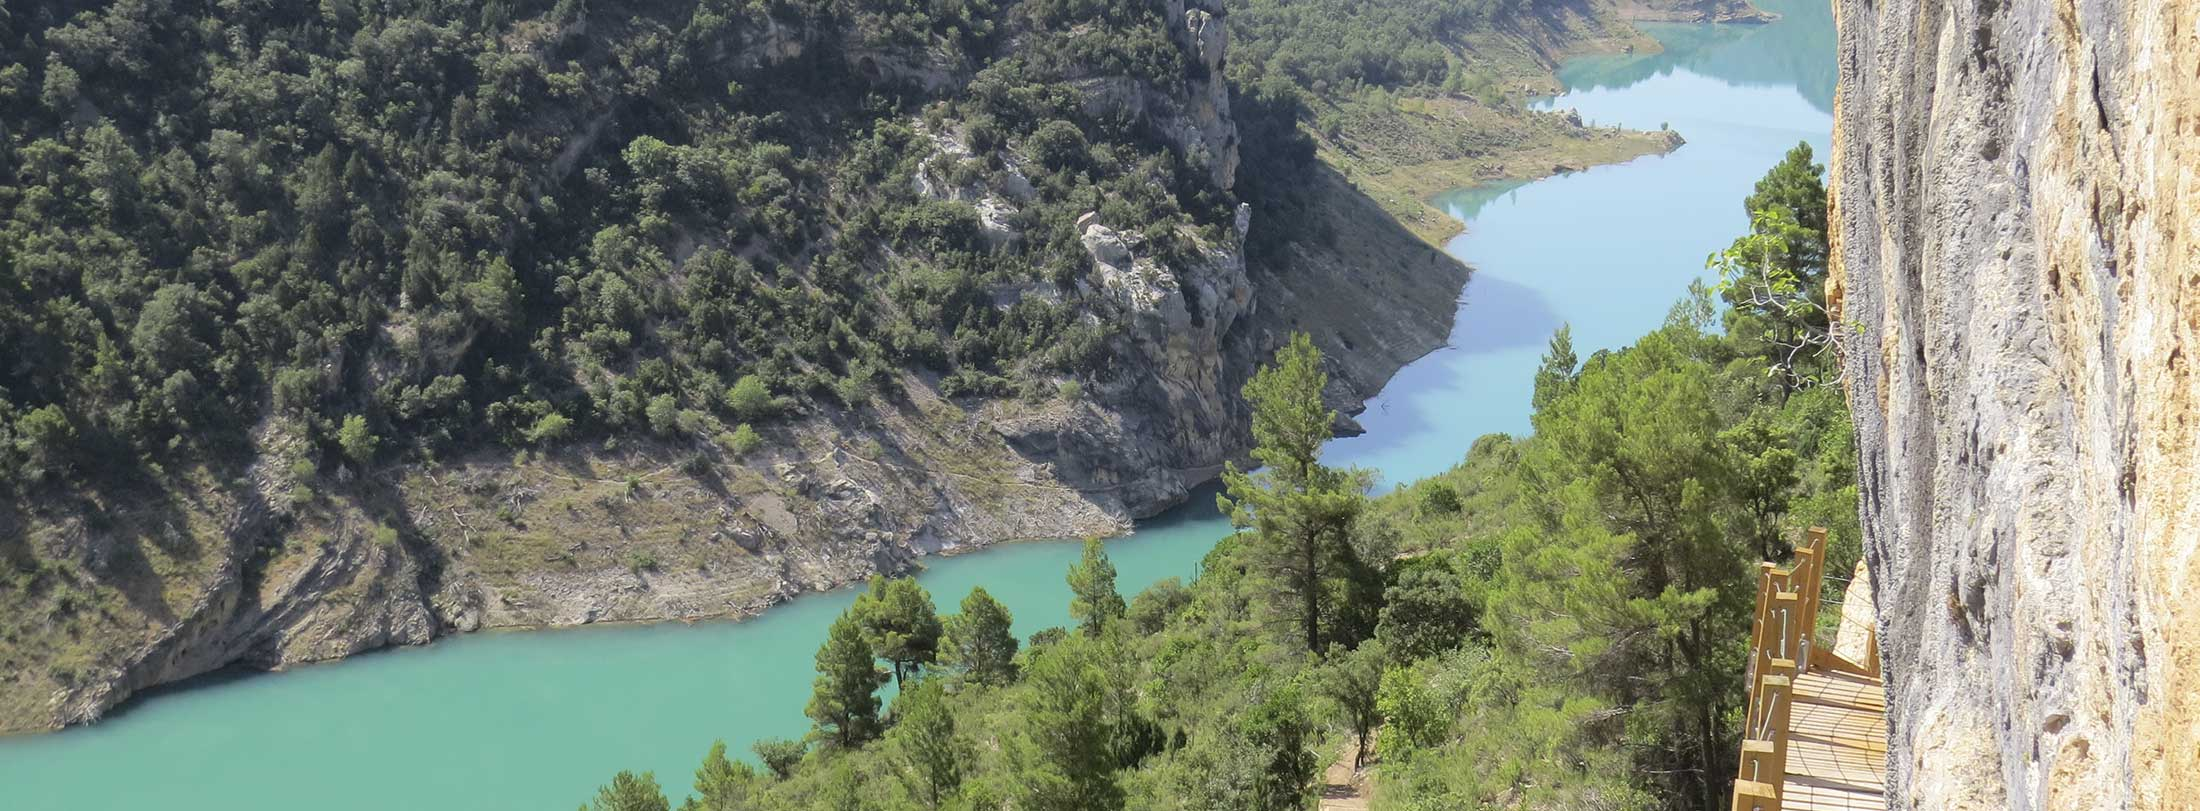 Ruta por la sierra del Montsec: Congost de Mont-rebei - Montfalcó